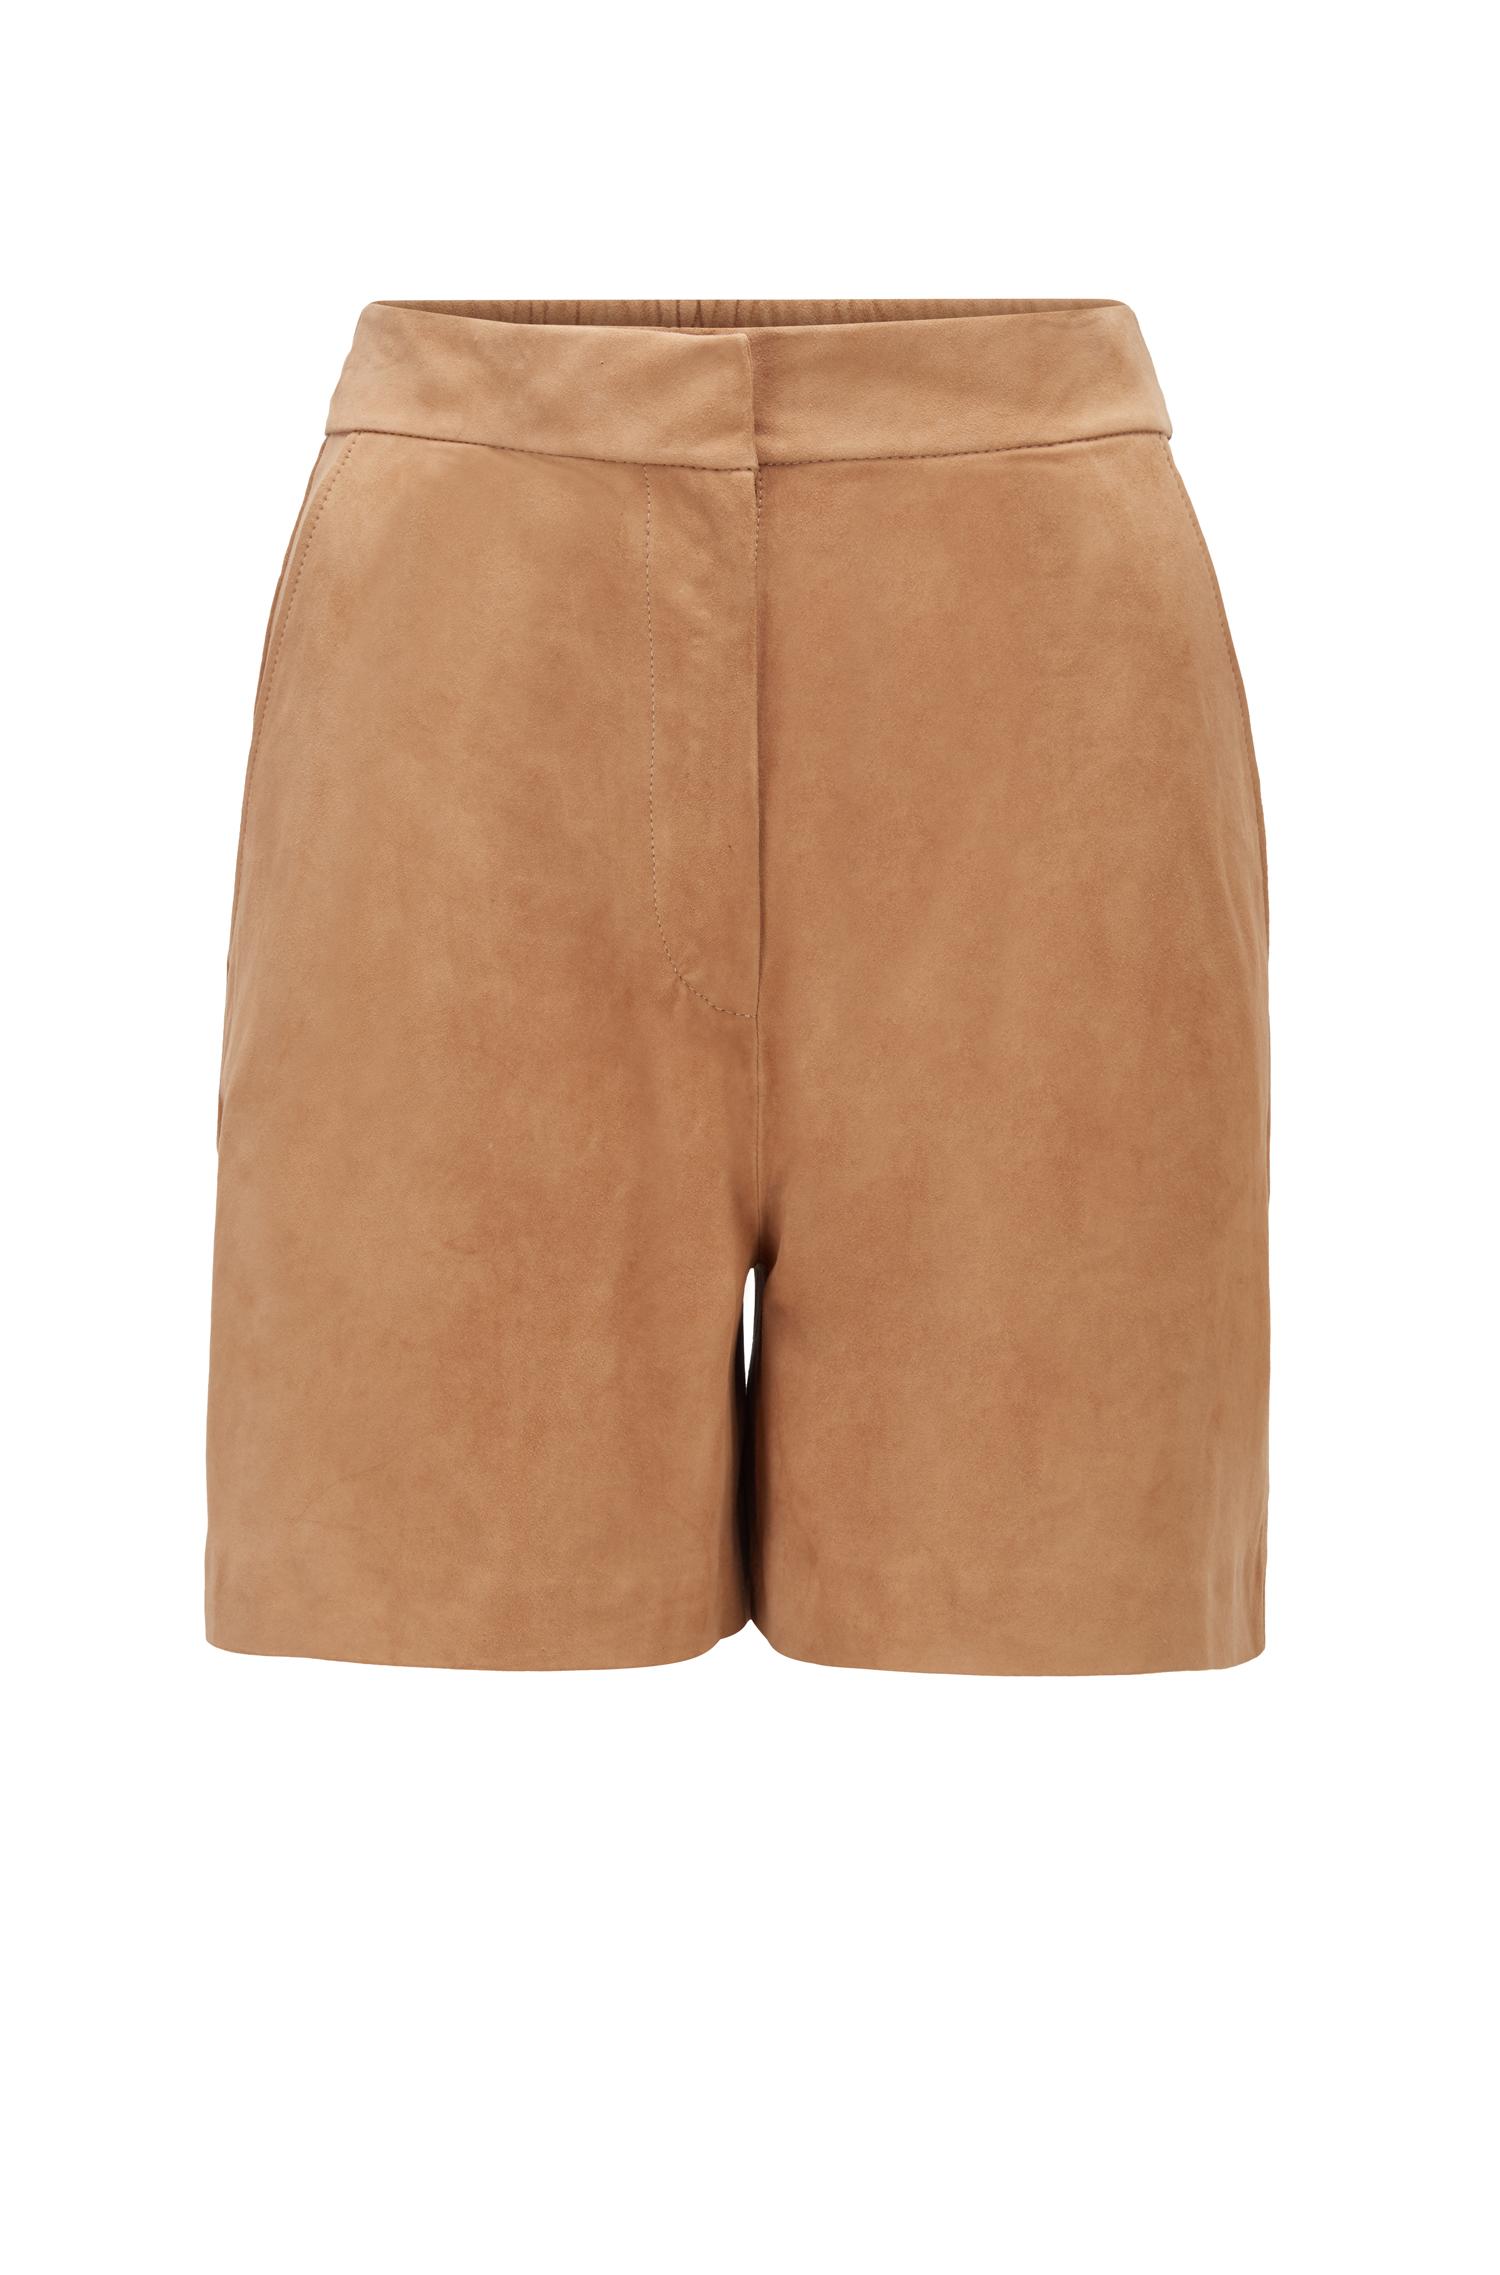 Shorts in pelle scamosciata con vita parzialmente elastica BOSS | Shorts | 50456339262